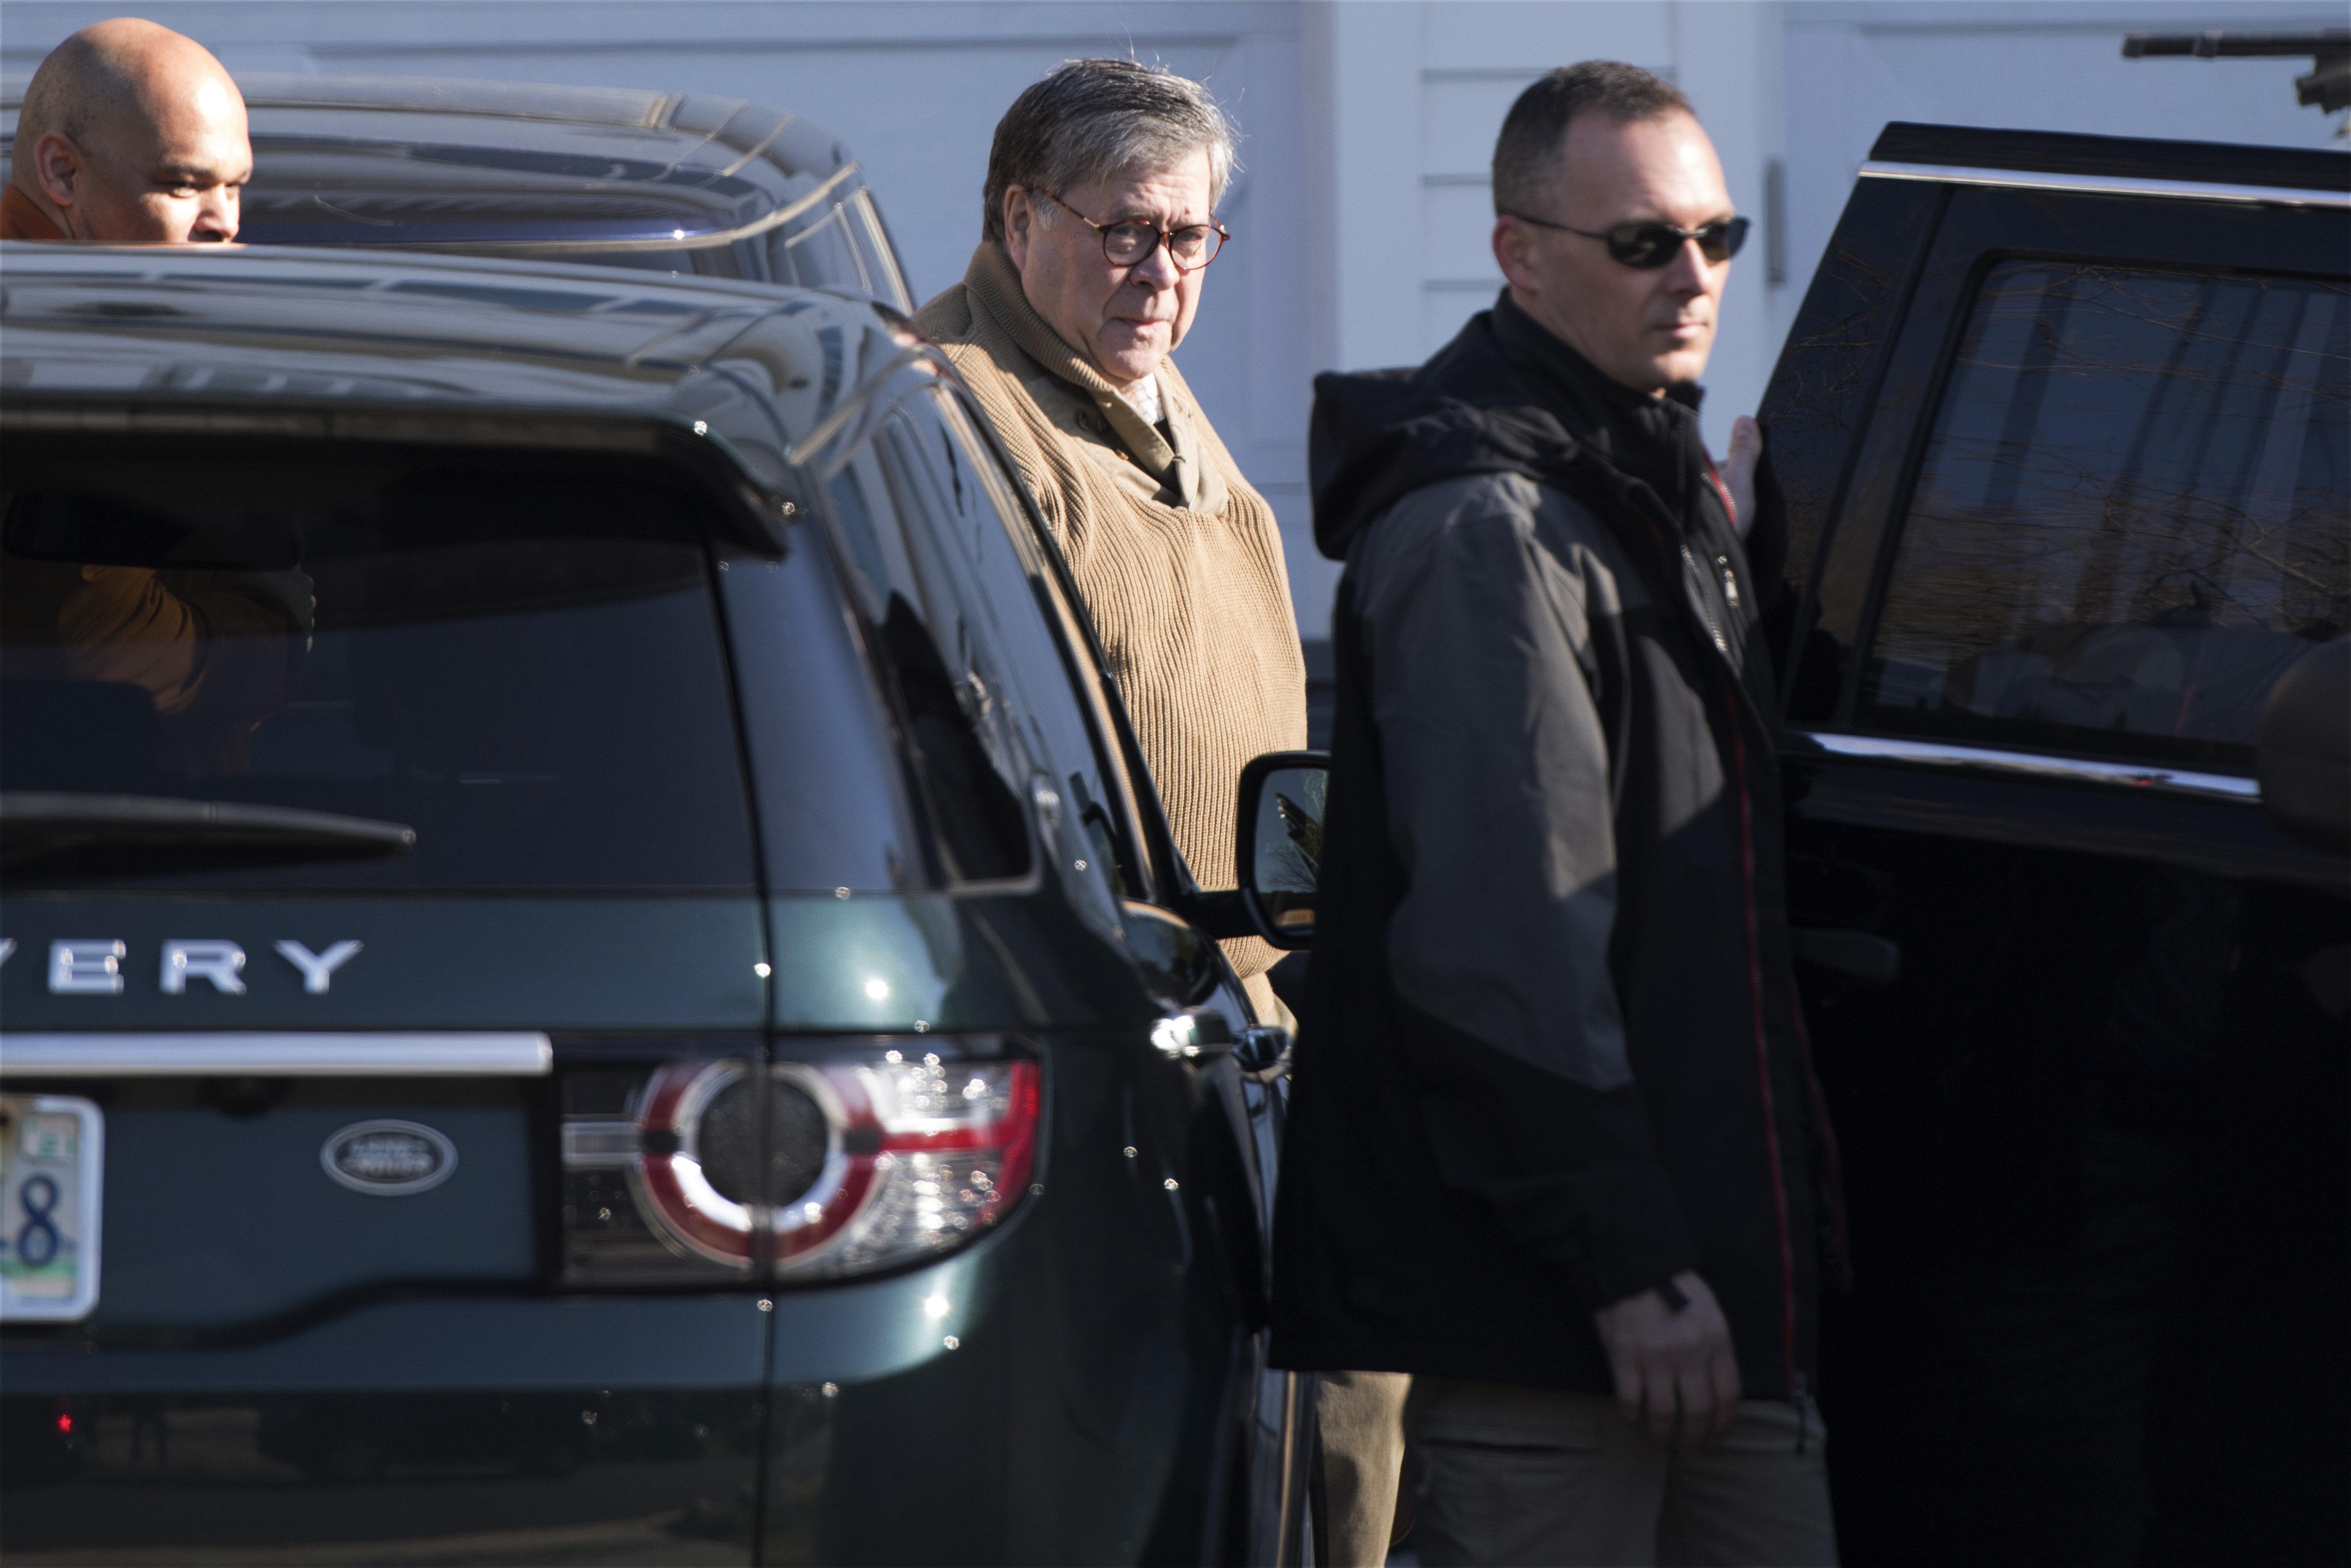 Attorney General William Barr Preparing To Reveal 'Key Findings' Of Mueller